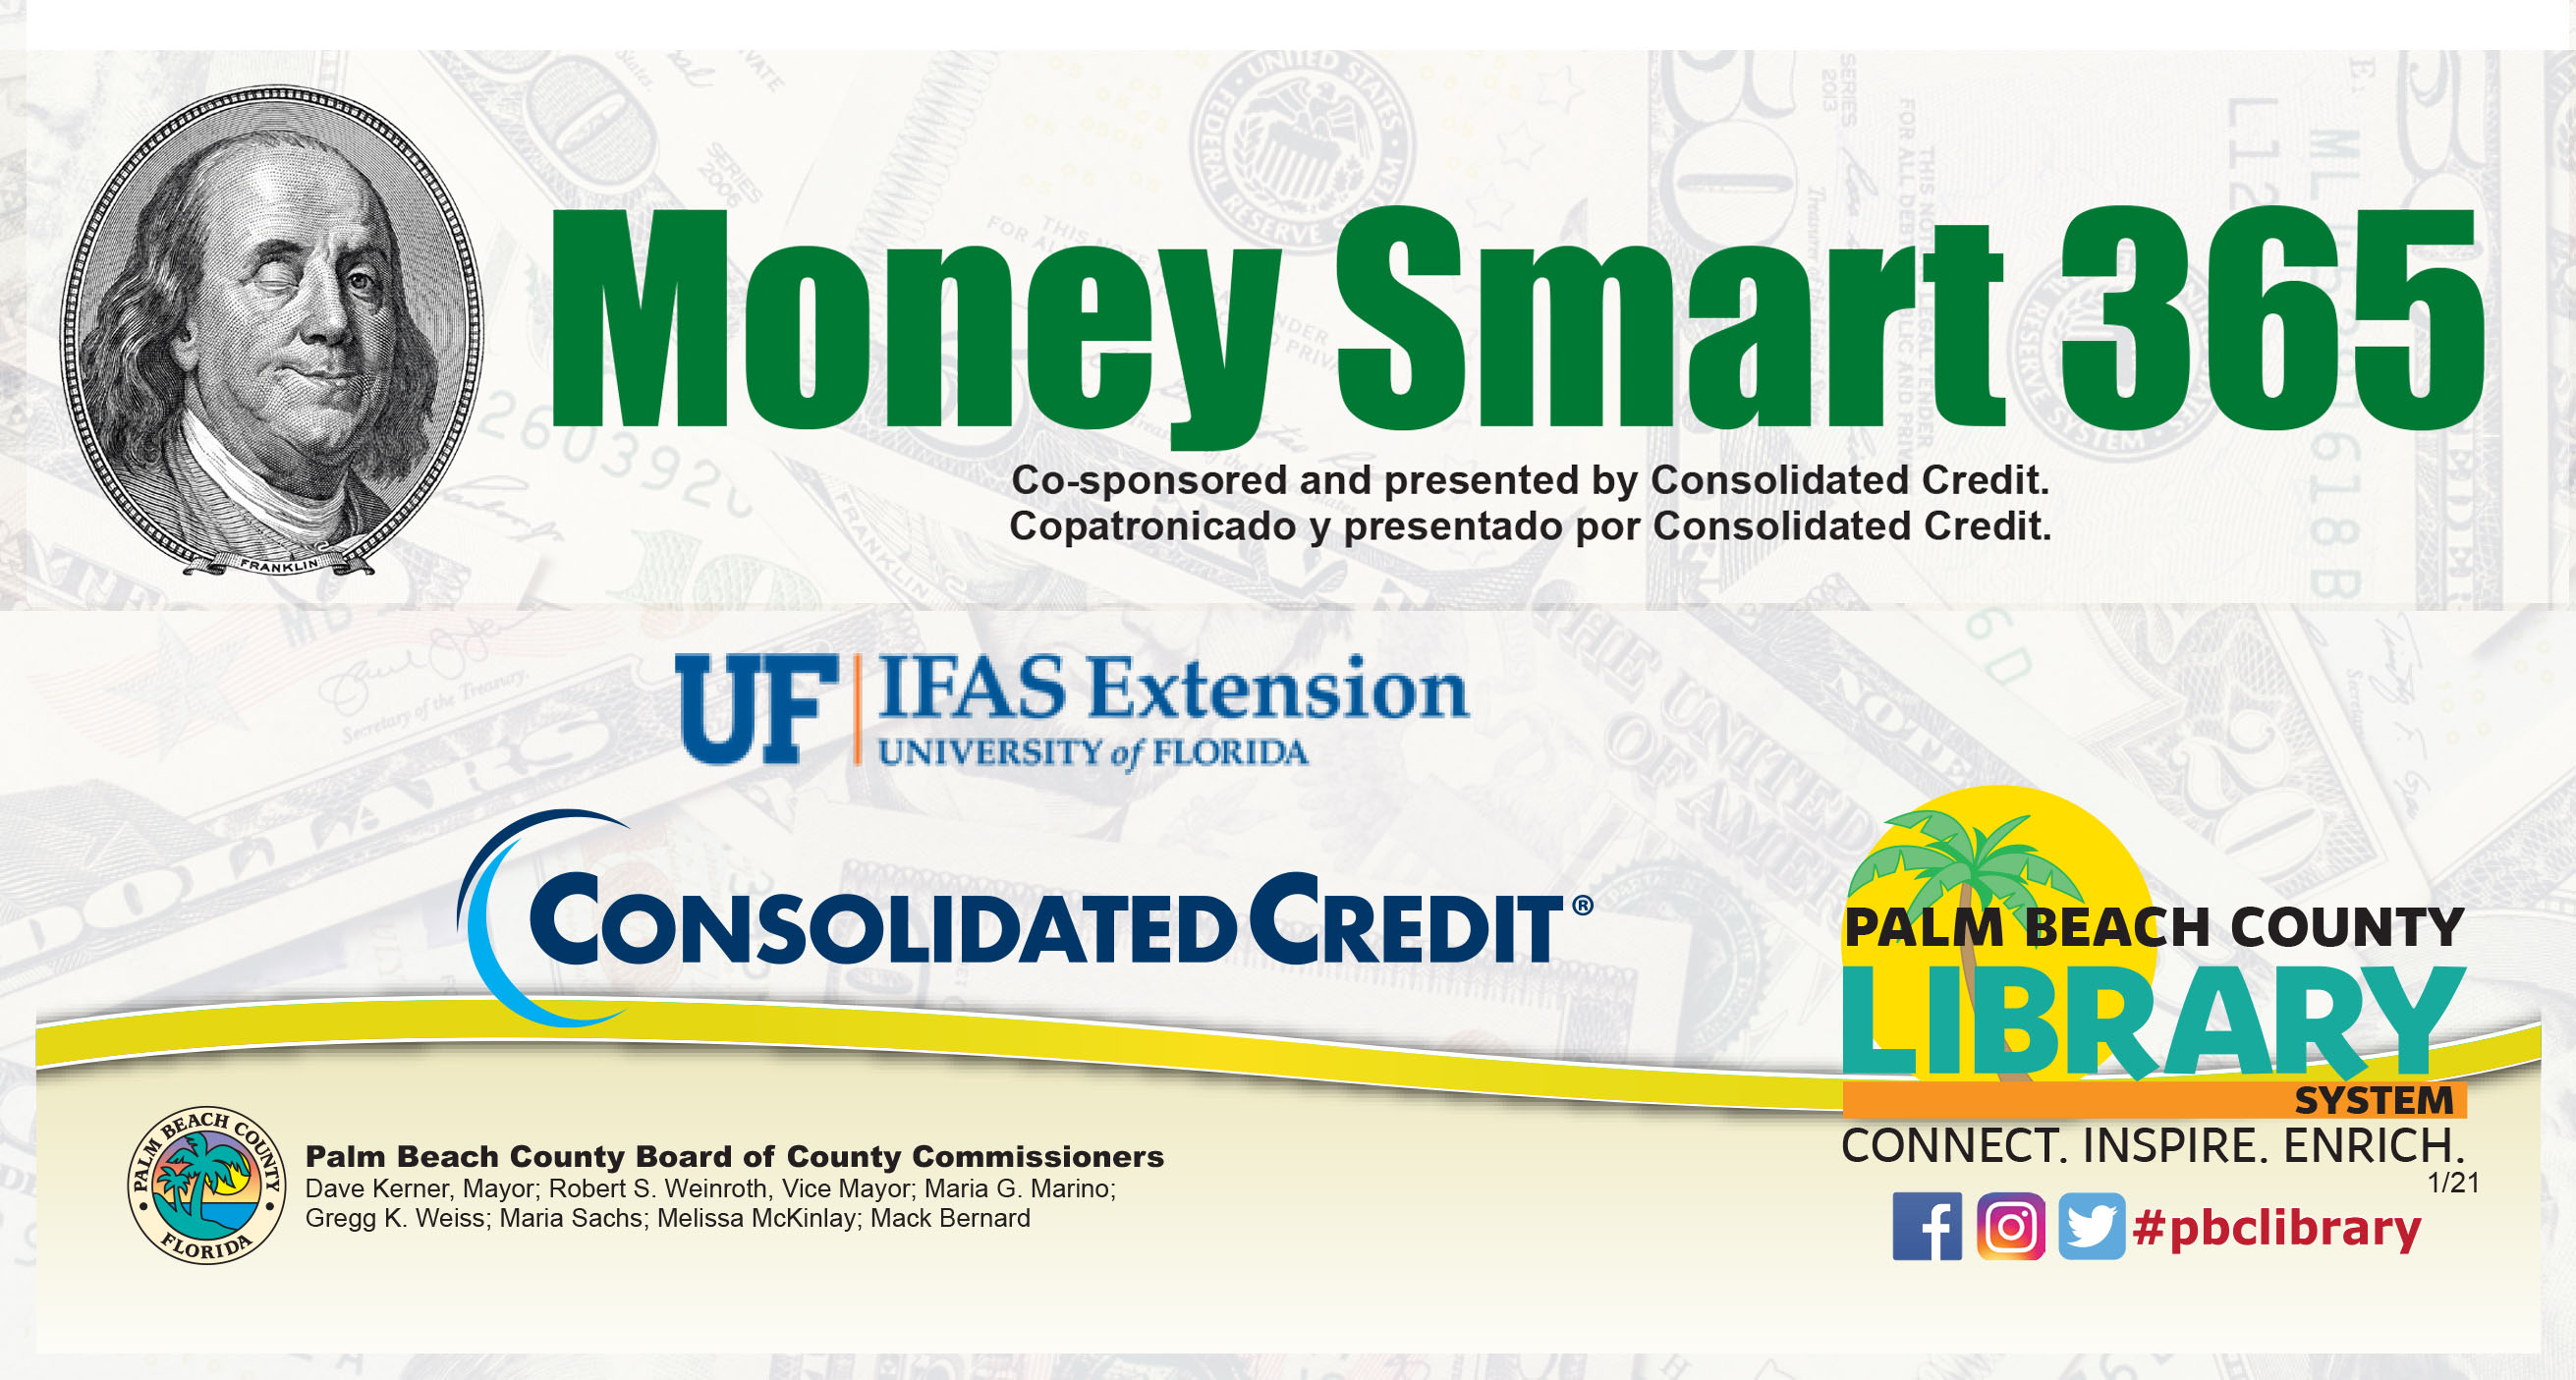 /coextension/FACS/SiteImages/News/Money Smart.jpg